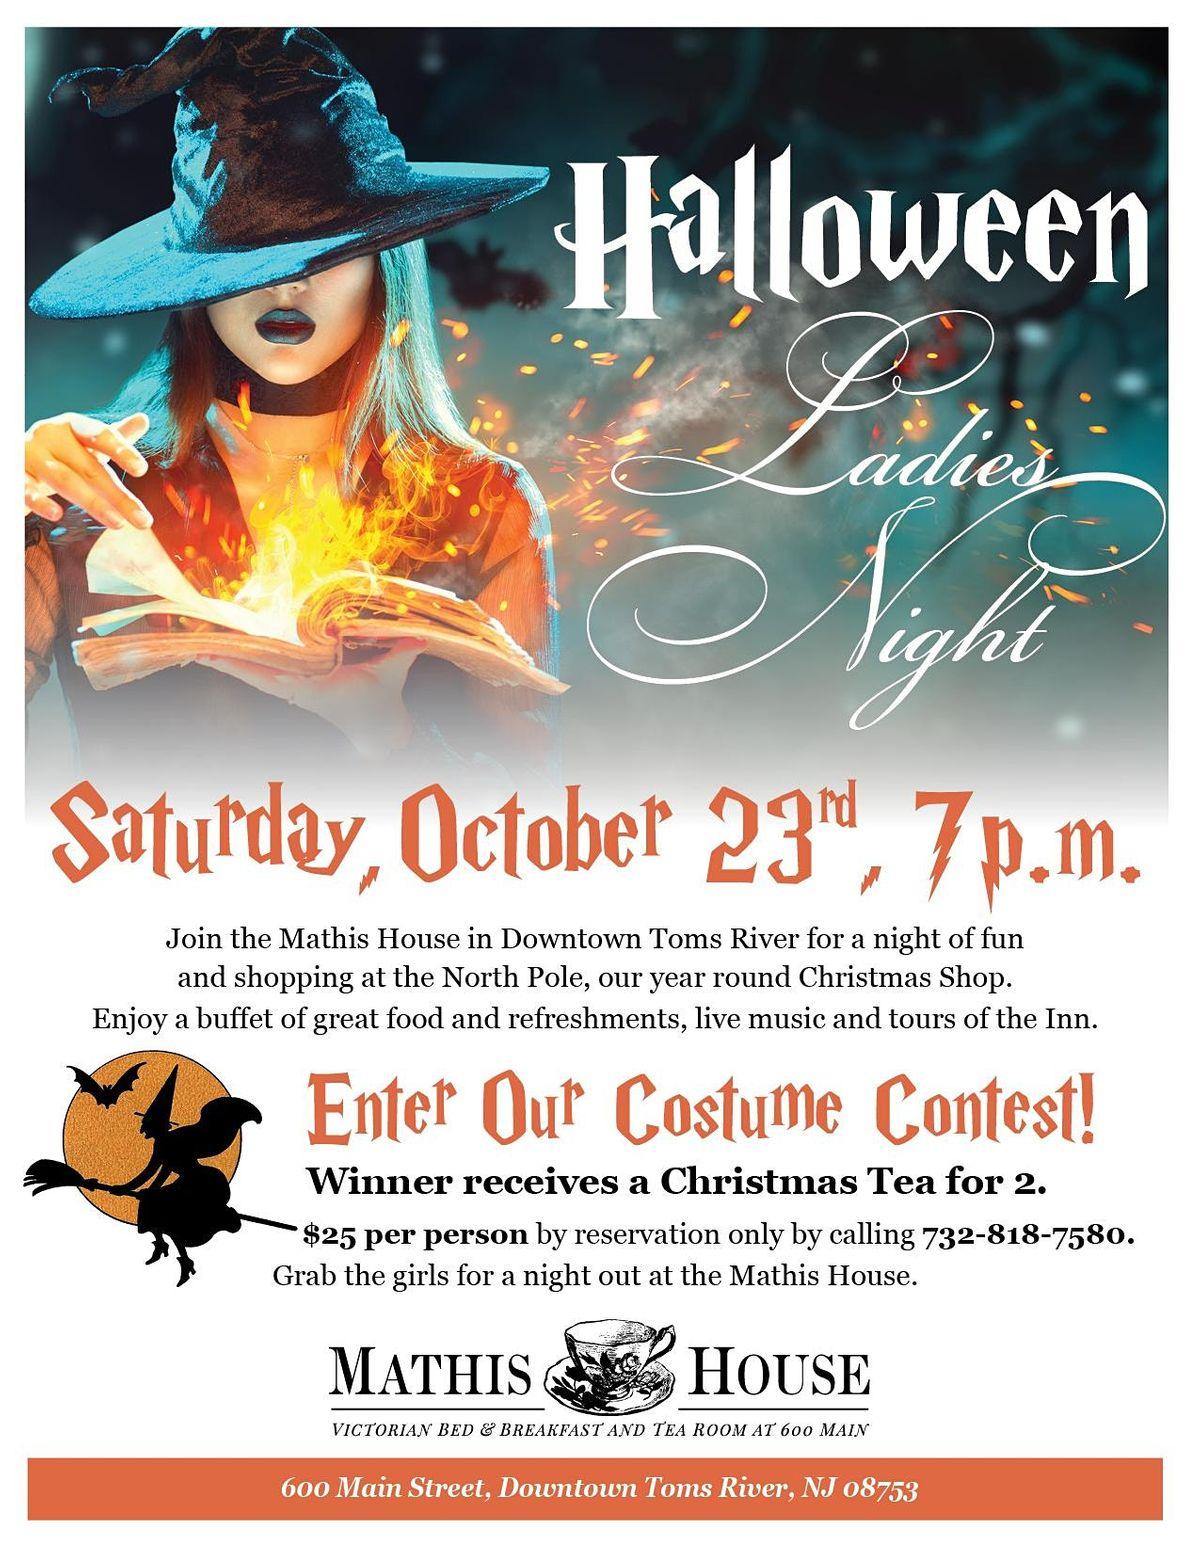 Ladies Night Halloween Costume Contest, 23 October | Event in Toms River | AllEvents.in